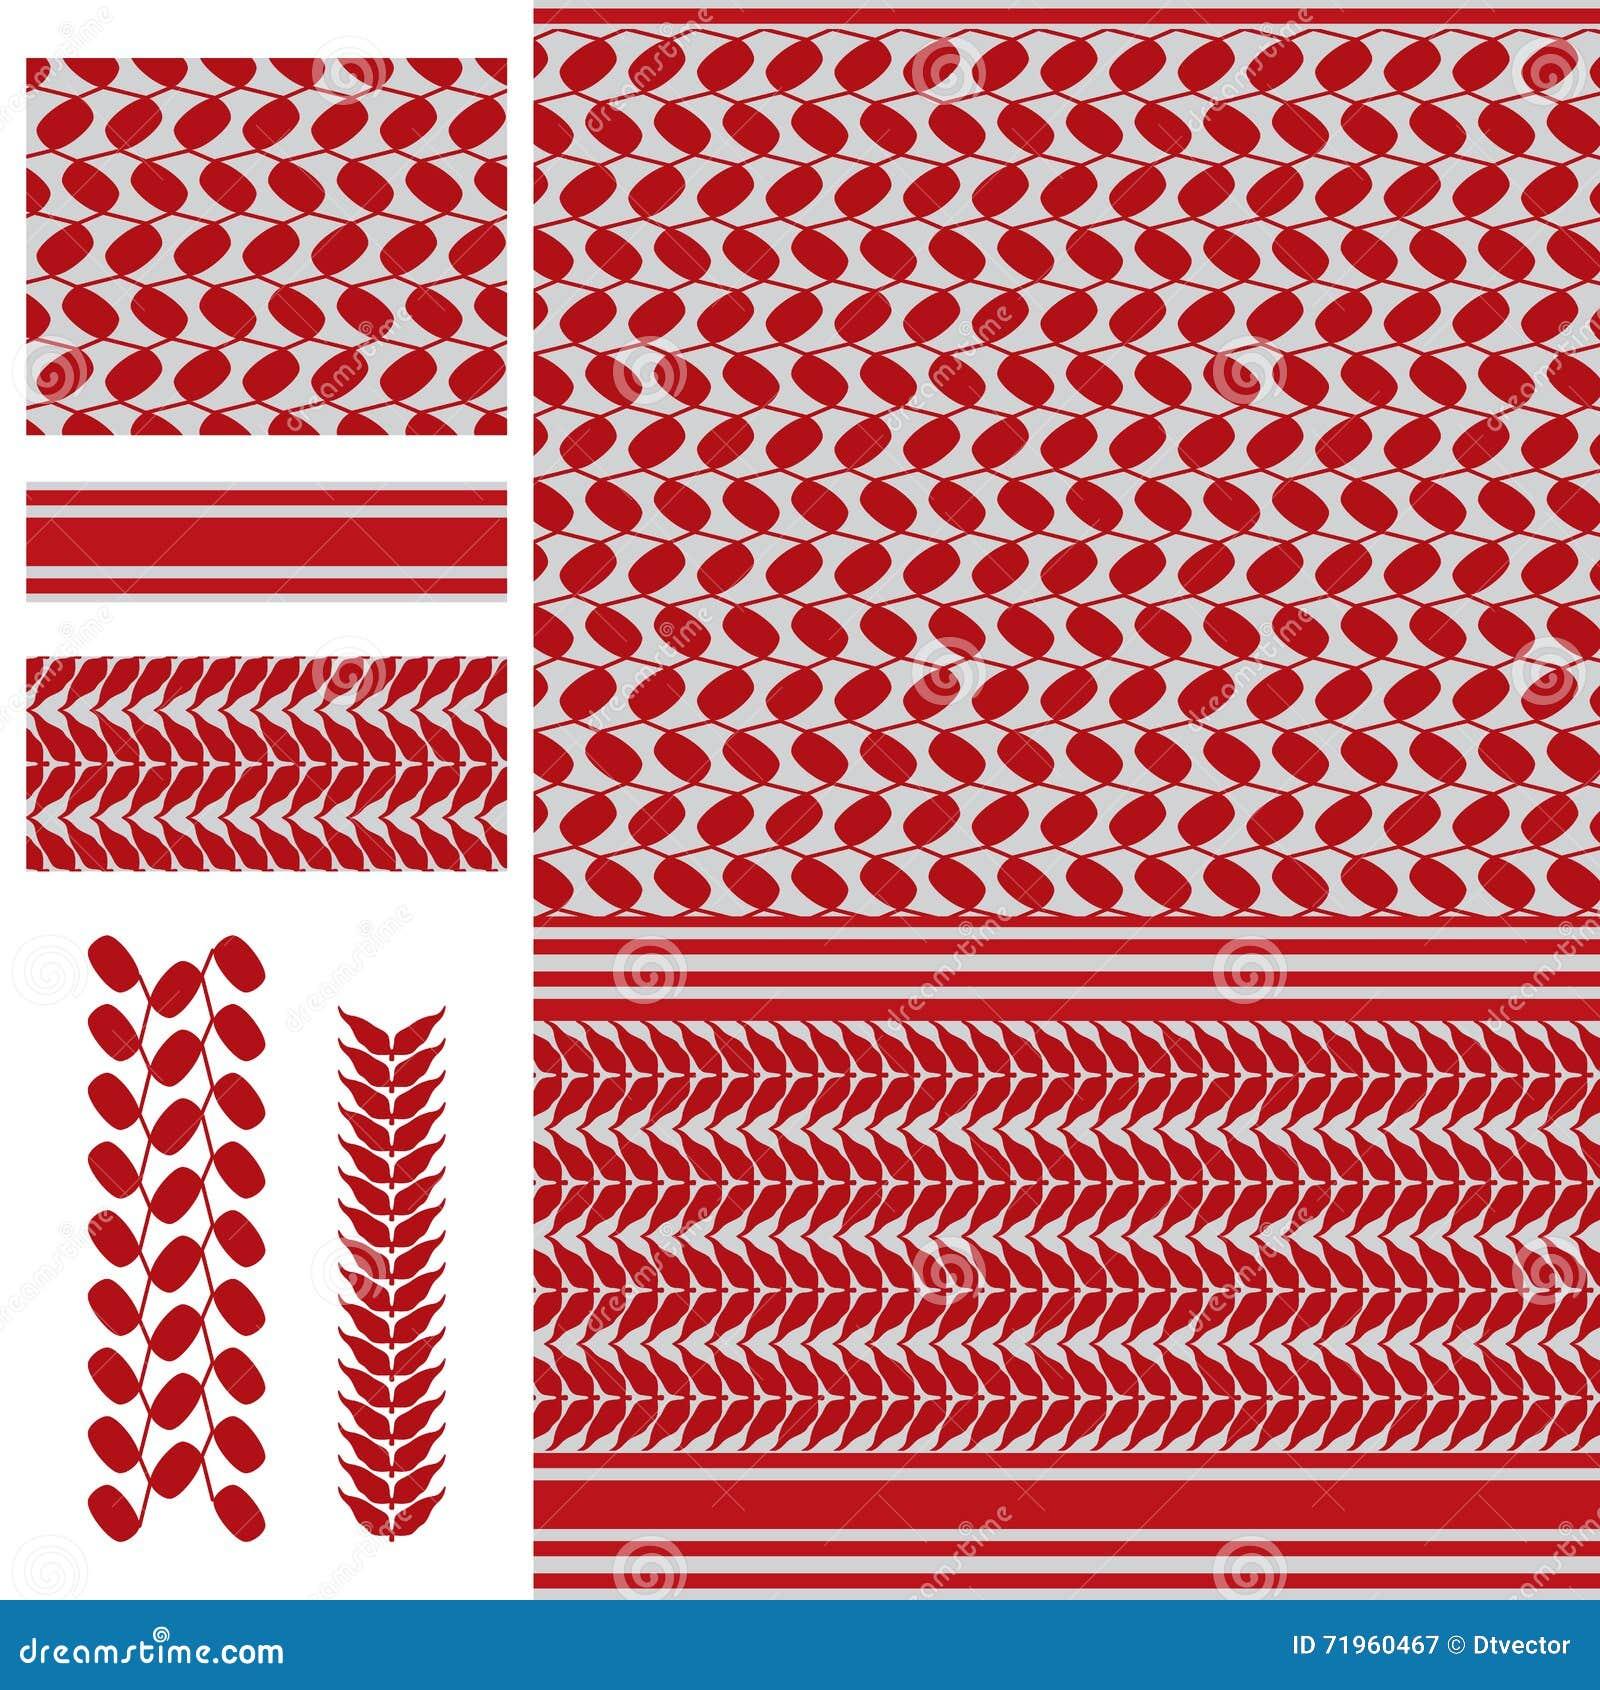 Palestine Keffieh Red White Seamless Pattern Stock Vector